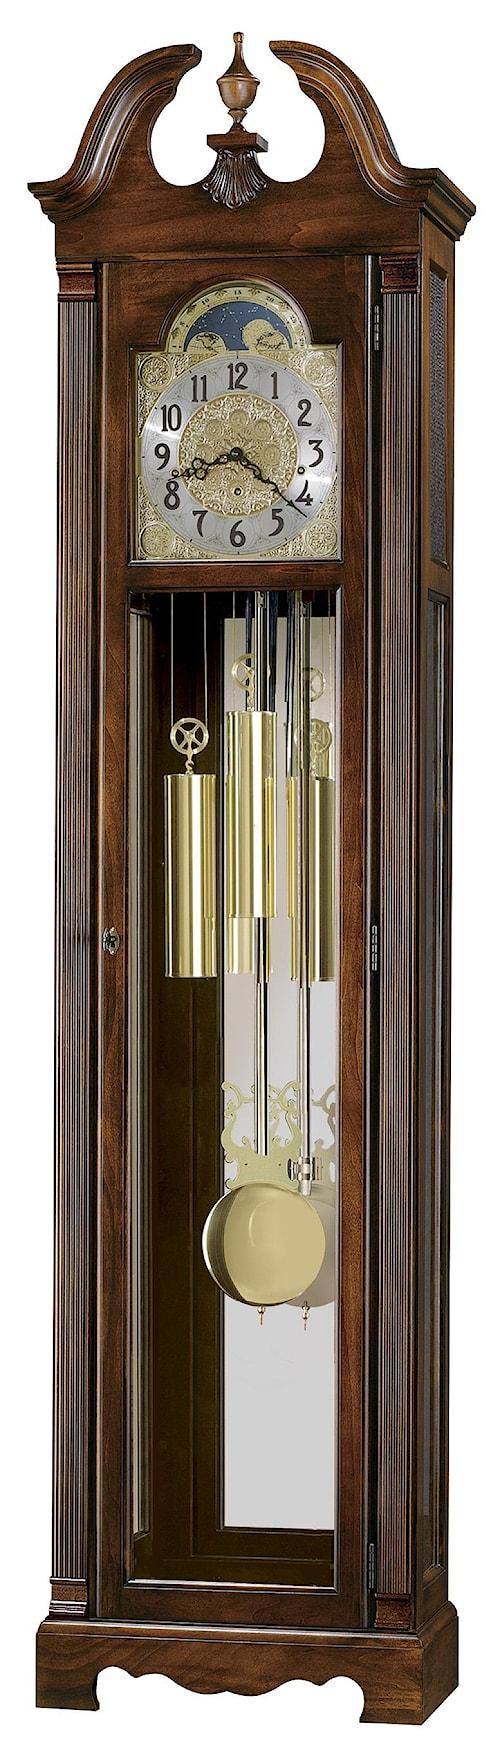 Howard Miller Clocks Warren Grandfather Clock with Polished Brass Dial